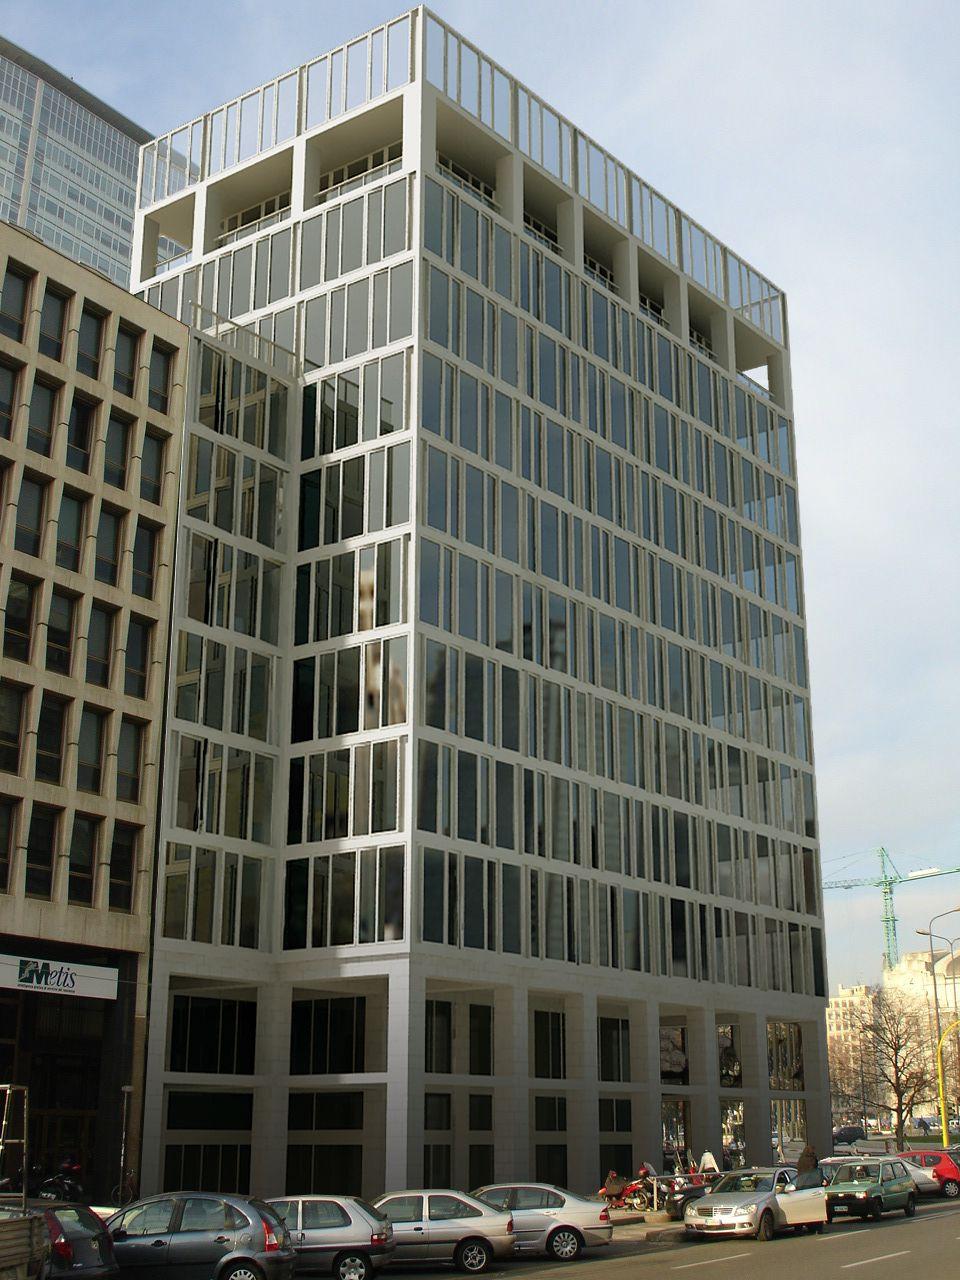 Office Building - Stazione Centrale Milan 467